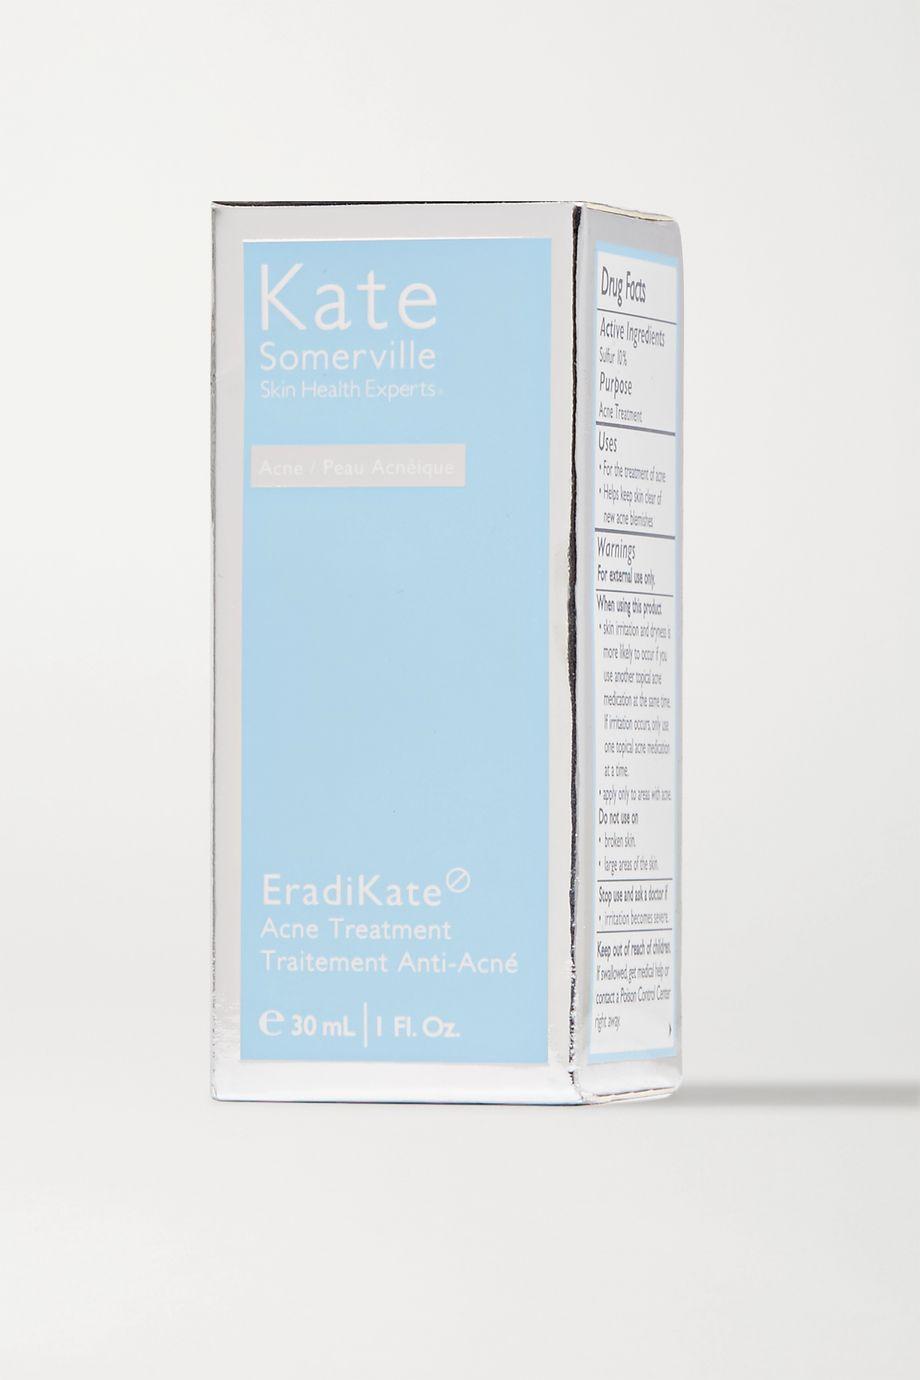 Kate Somerville EradiKate Acne Treatment, 30ml